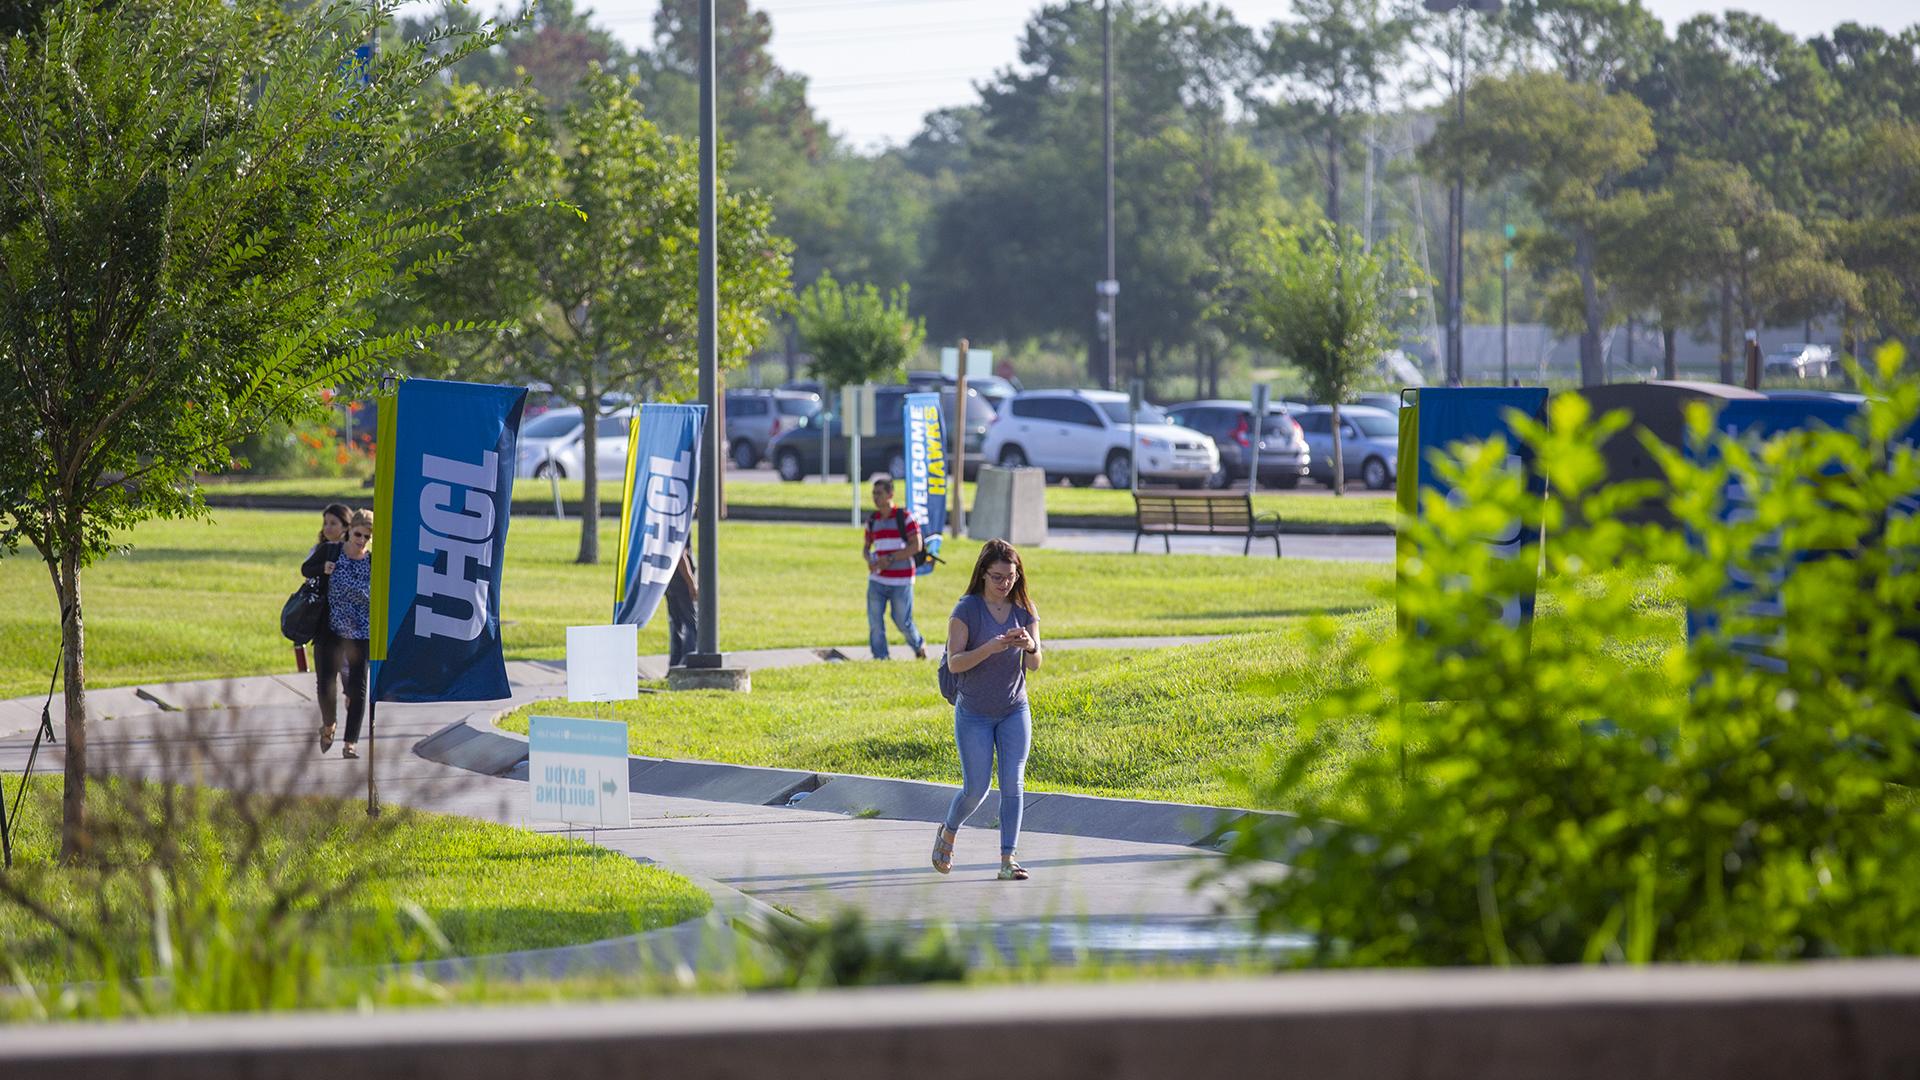 UHCL top public school in Texas in U.S. News western regional rankings